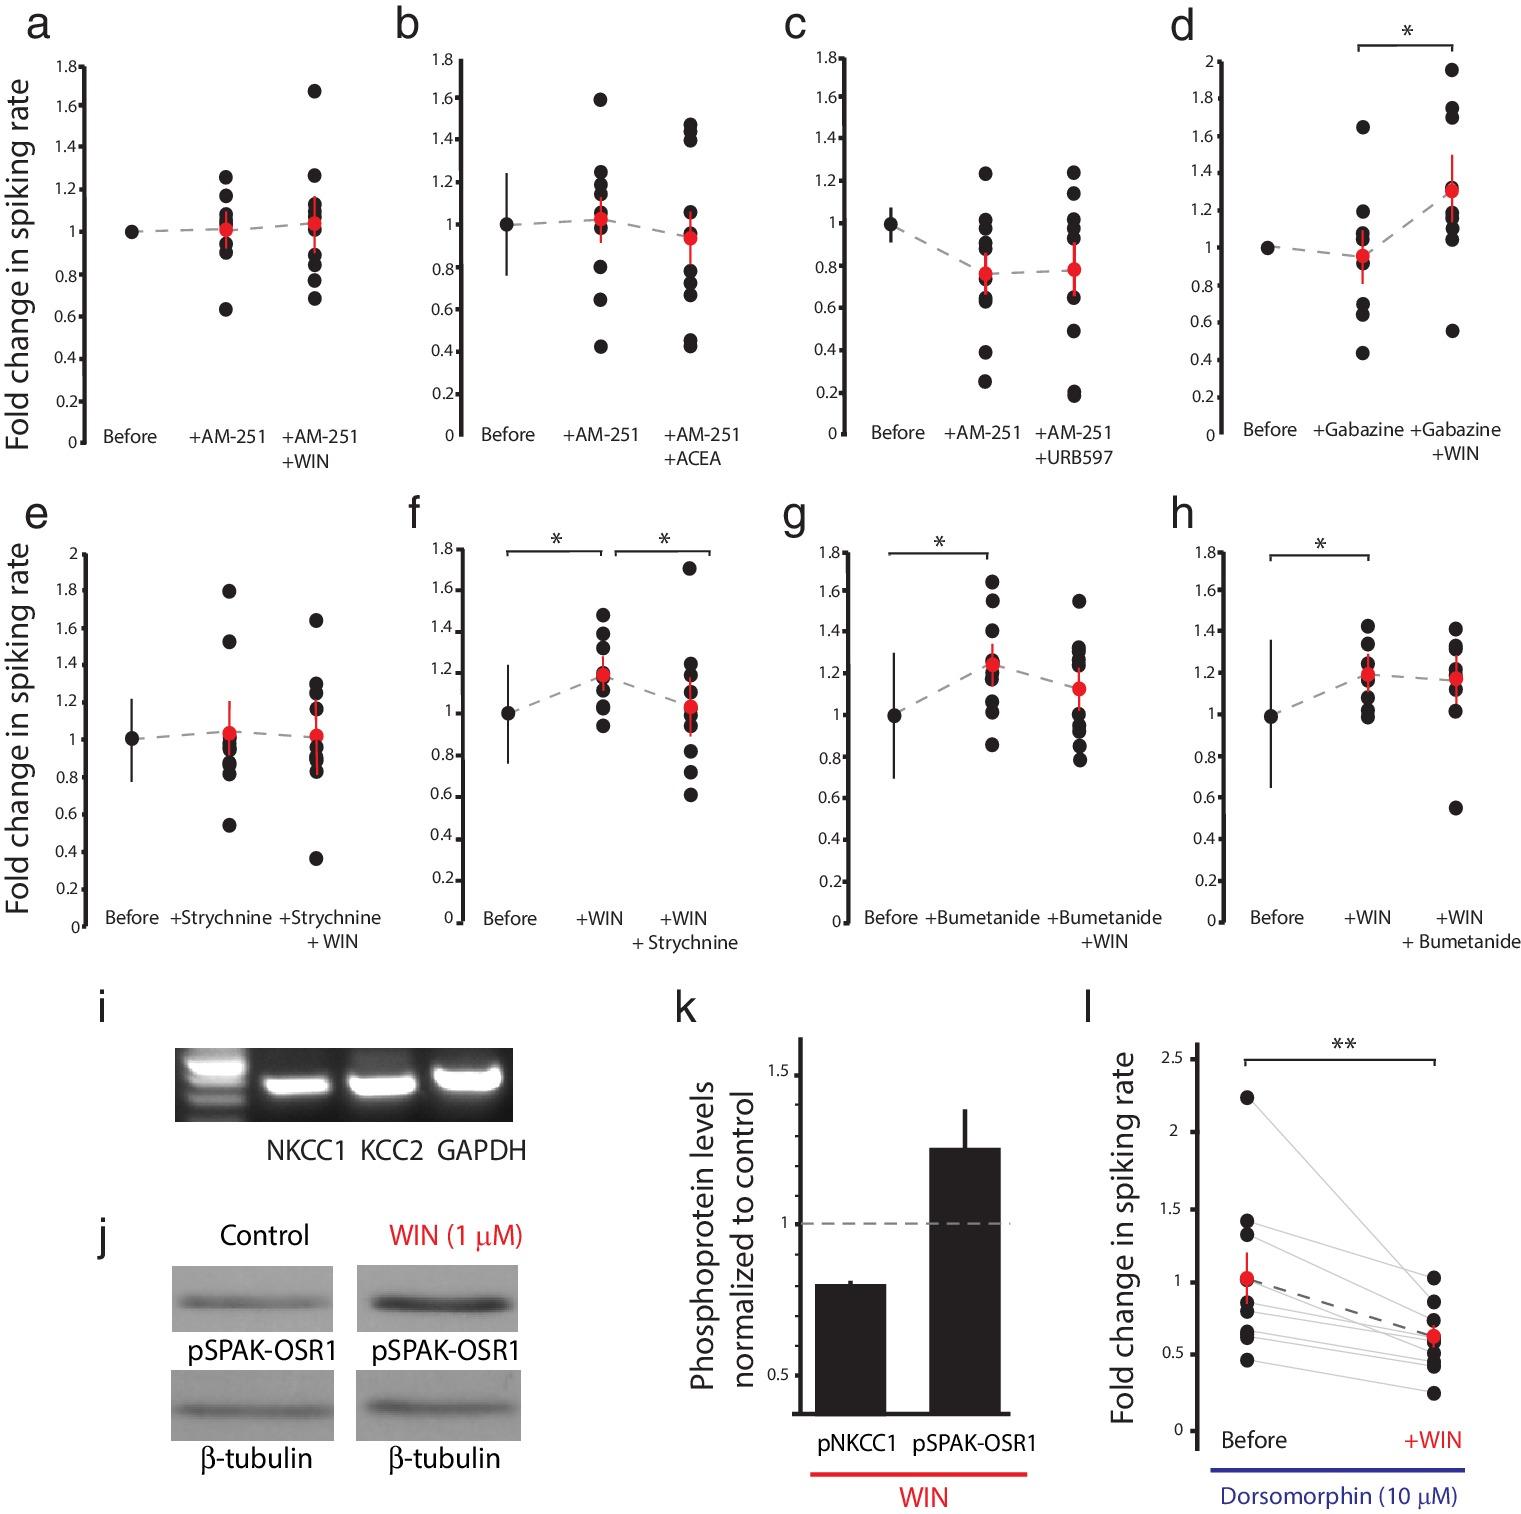 Endocannabinoid signaling enhances visual responses through